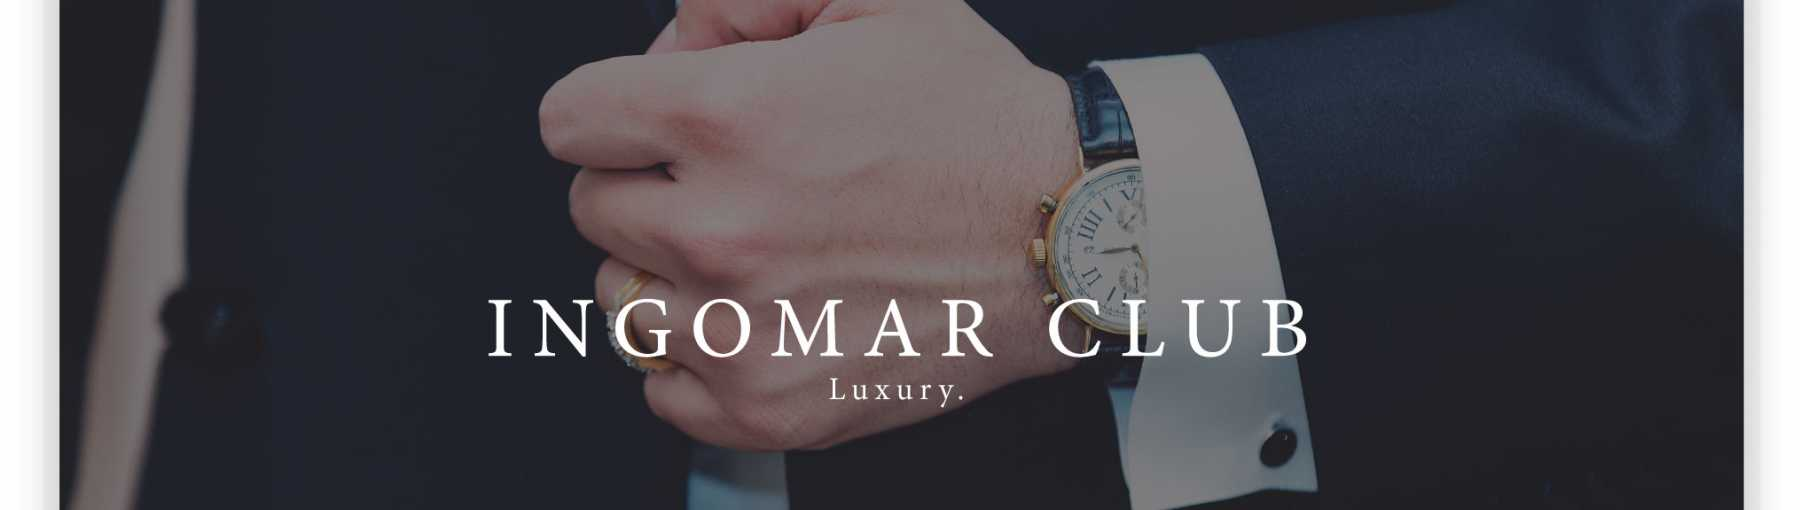 Image showcasing core design Theme - Luxury